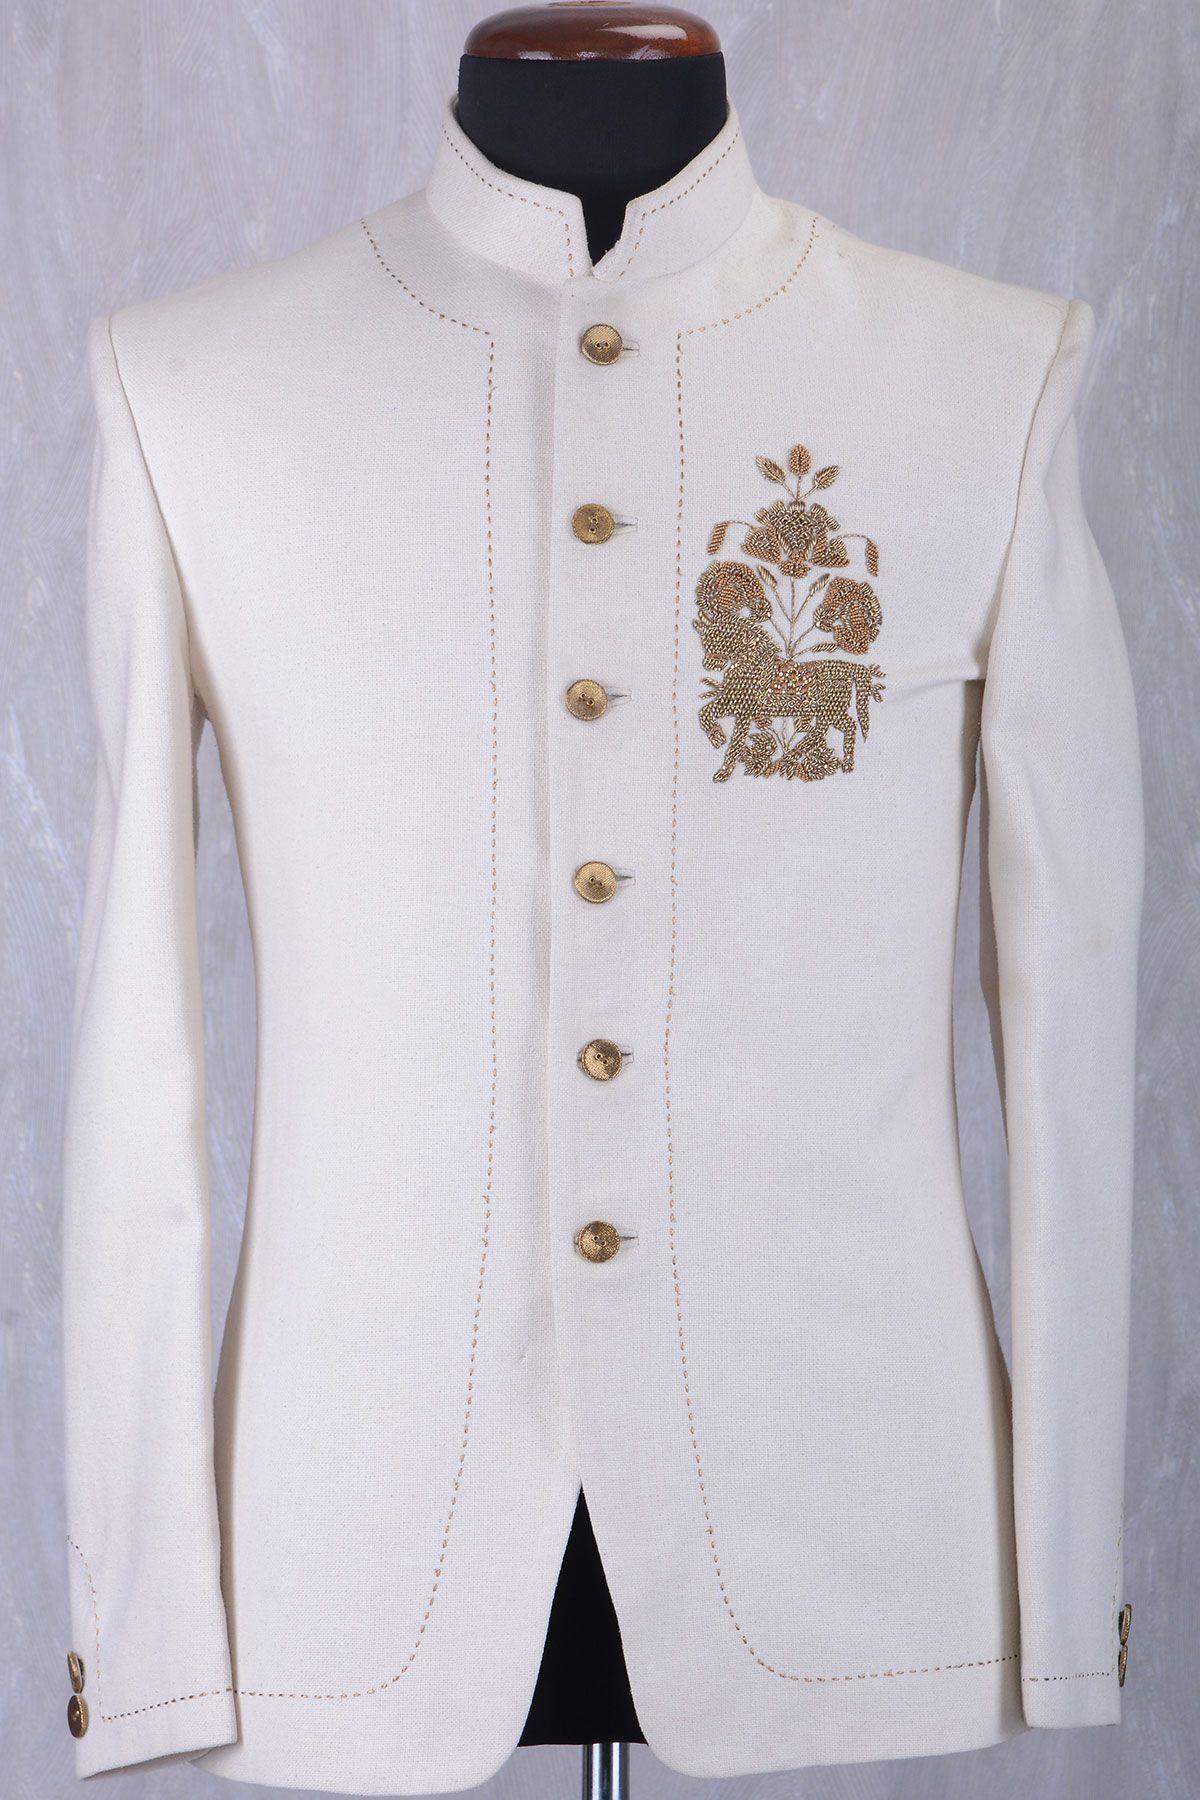 09cc0ed9eb Buy Off White Jute Zardosi Embroidered Jodhpuri Suit Online Samyakk  Bangalore